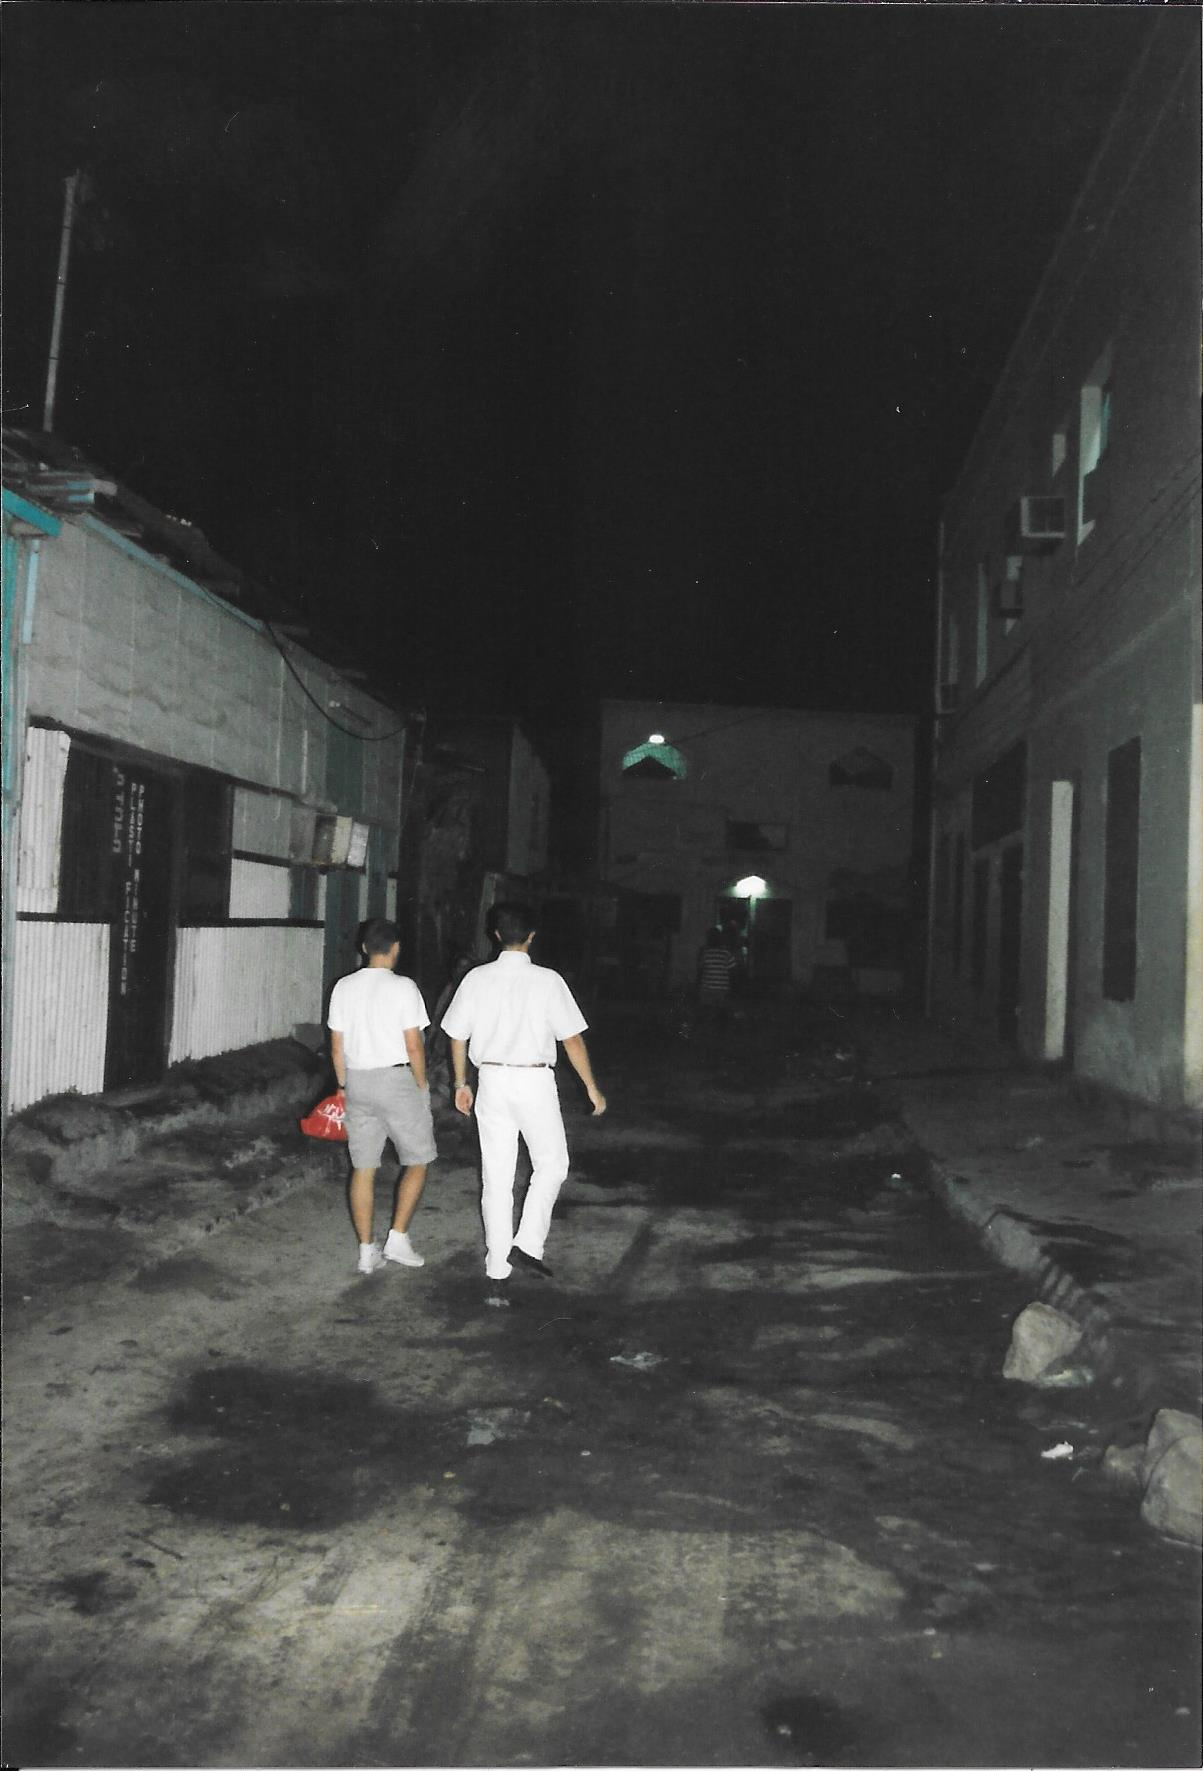 [Campagne] DJIBOUTI - TOME 1 - Page 22 113